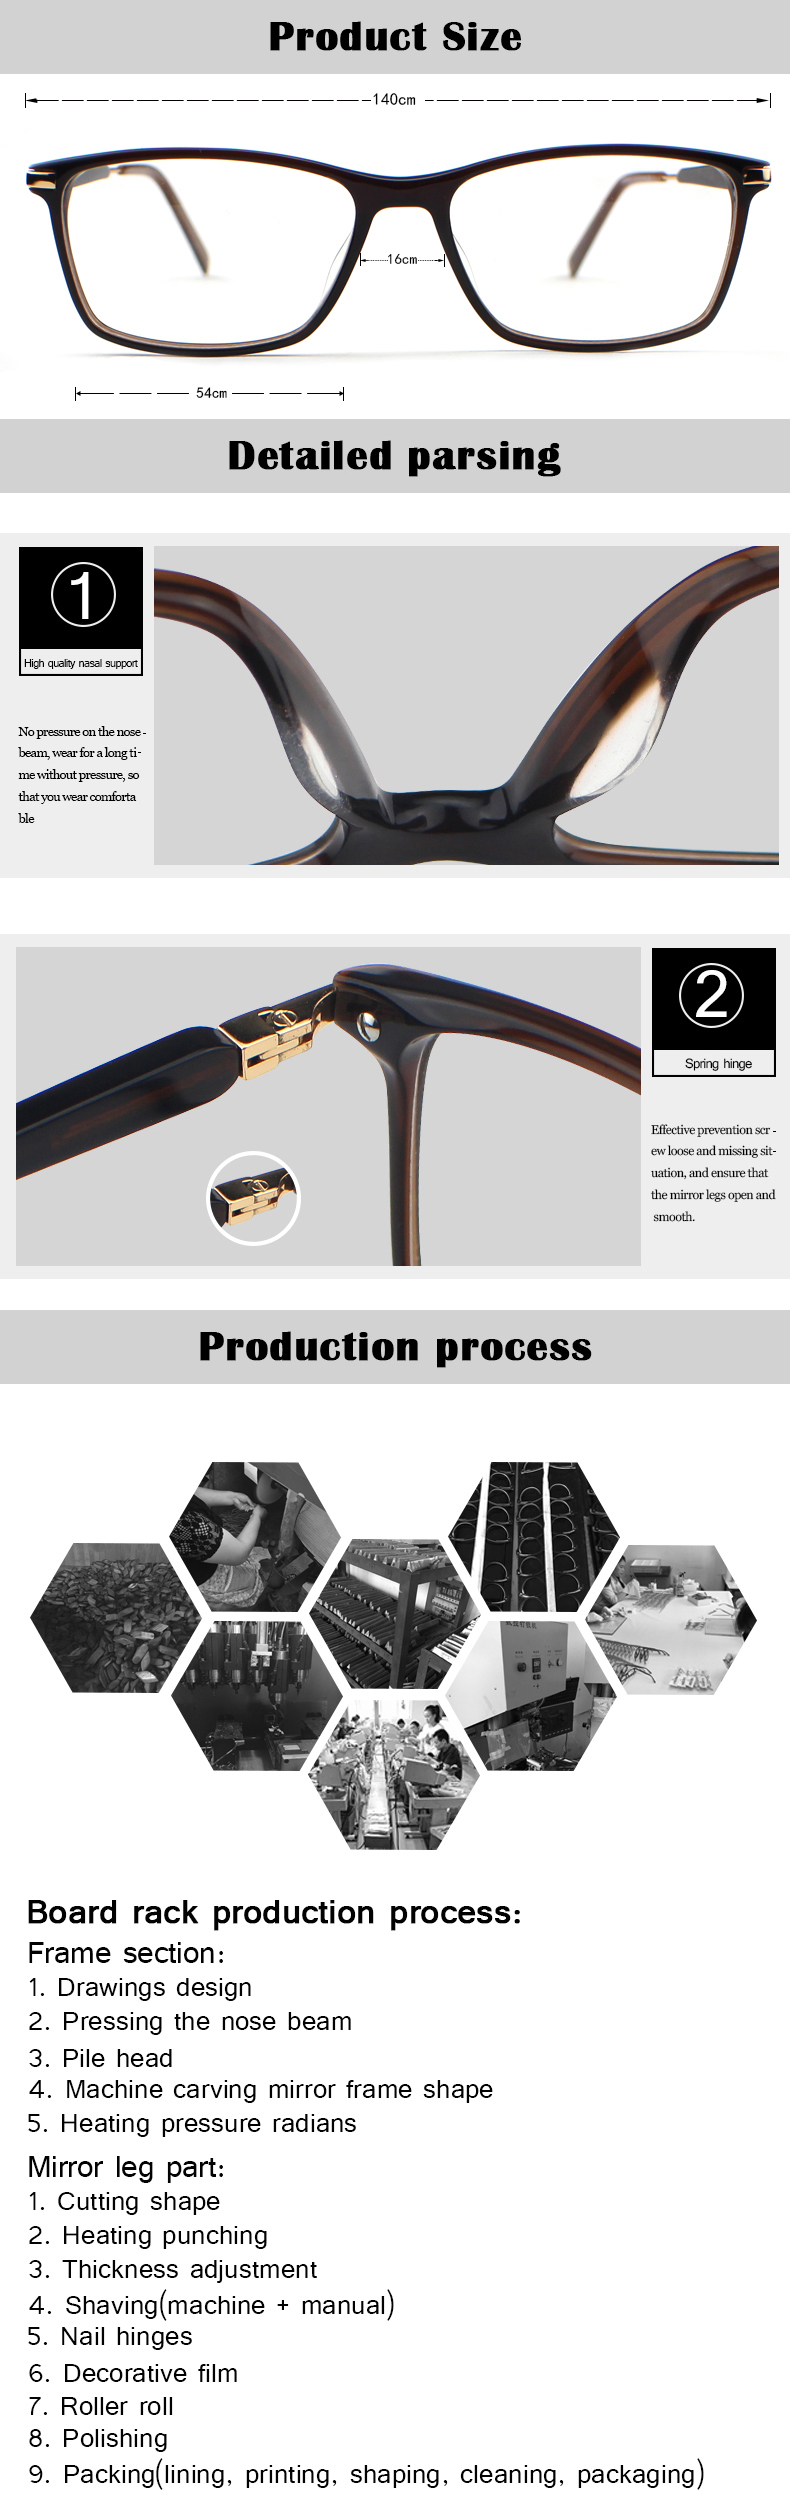 645ea6b57f3 Hot Marketing Max Cole Maybach Eyewear - Buy Marketing Eyewear